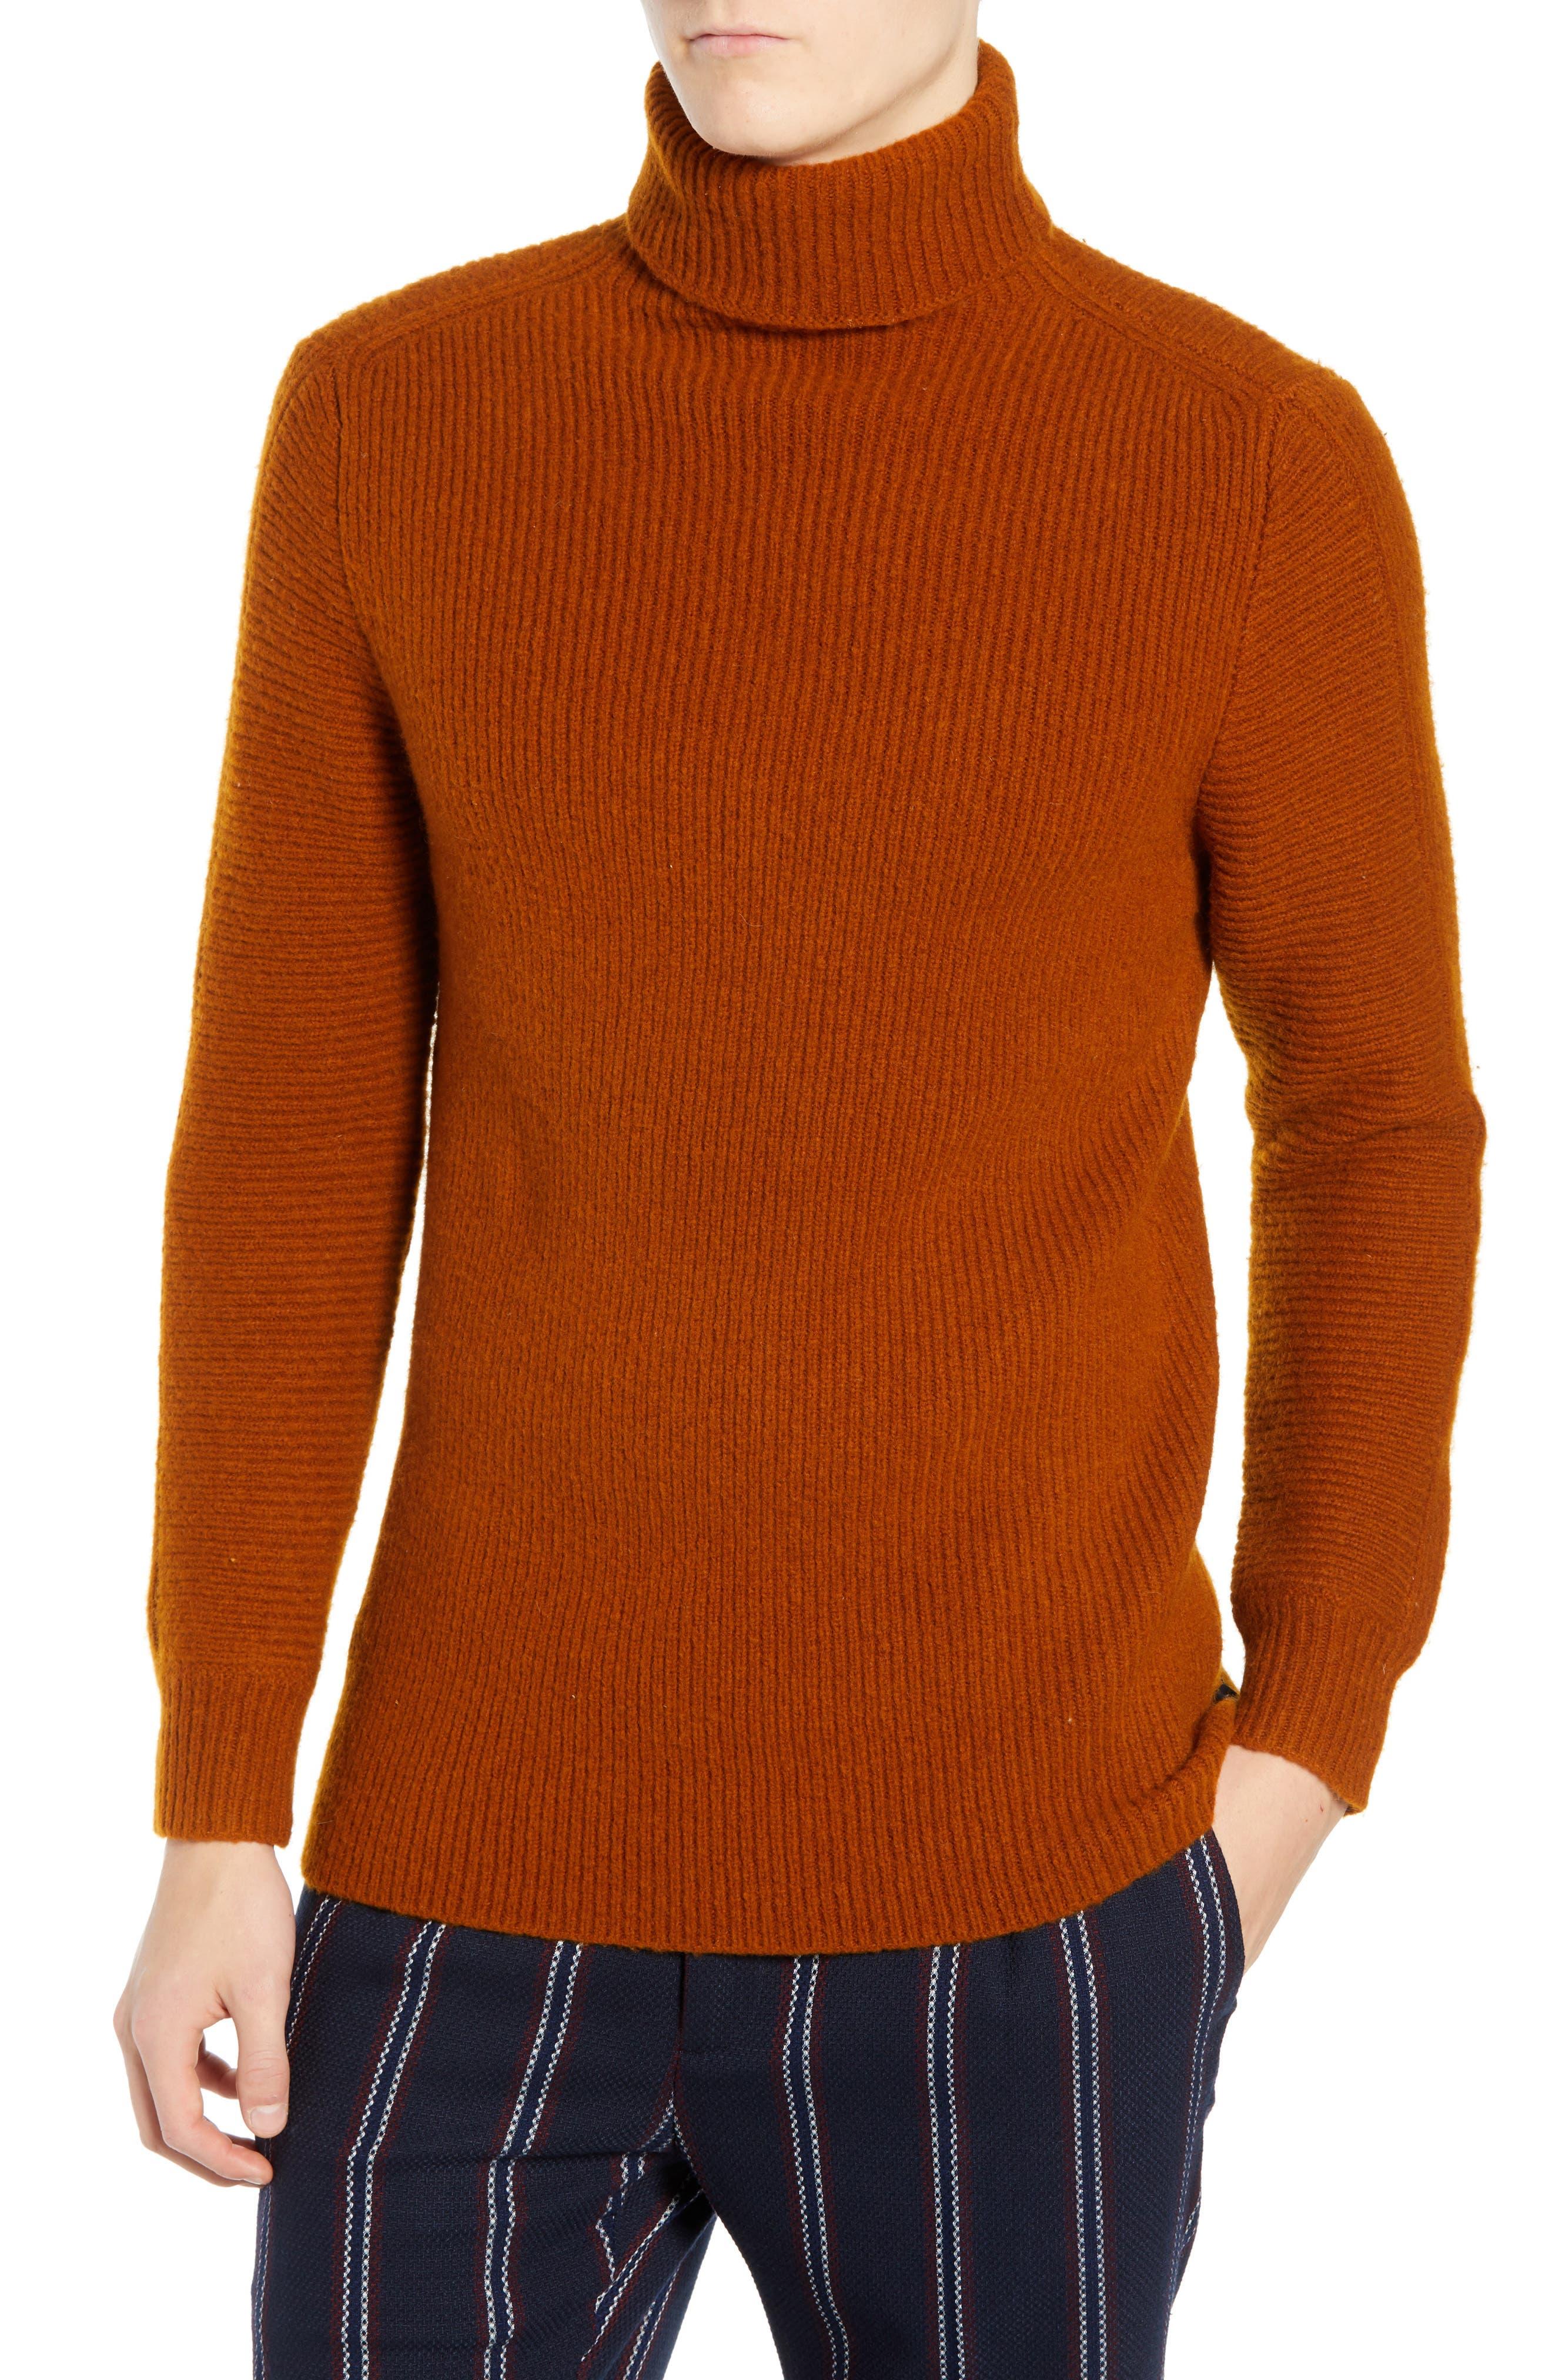 Wool Blend Turtleneck Sweater,                             Main thumbnail 1, color,                             RUSSET BROWN